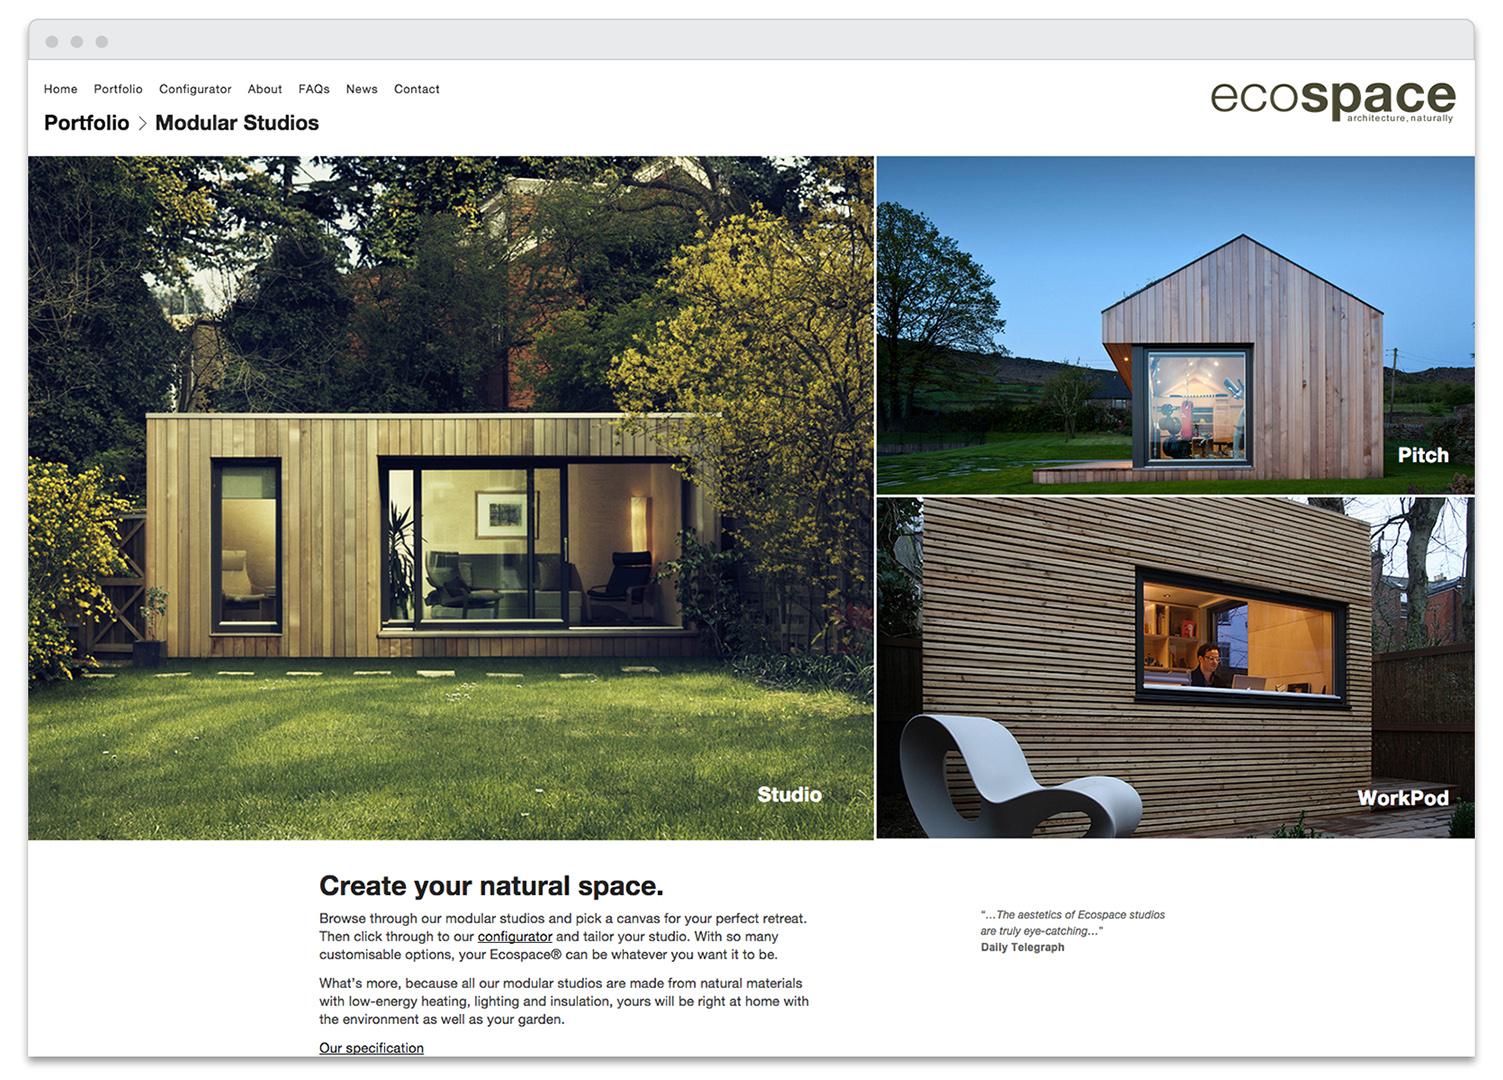 Ecospace-Browser-modular